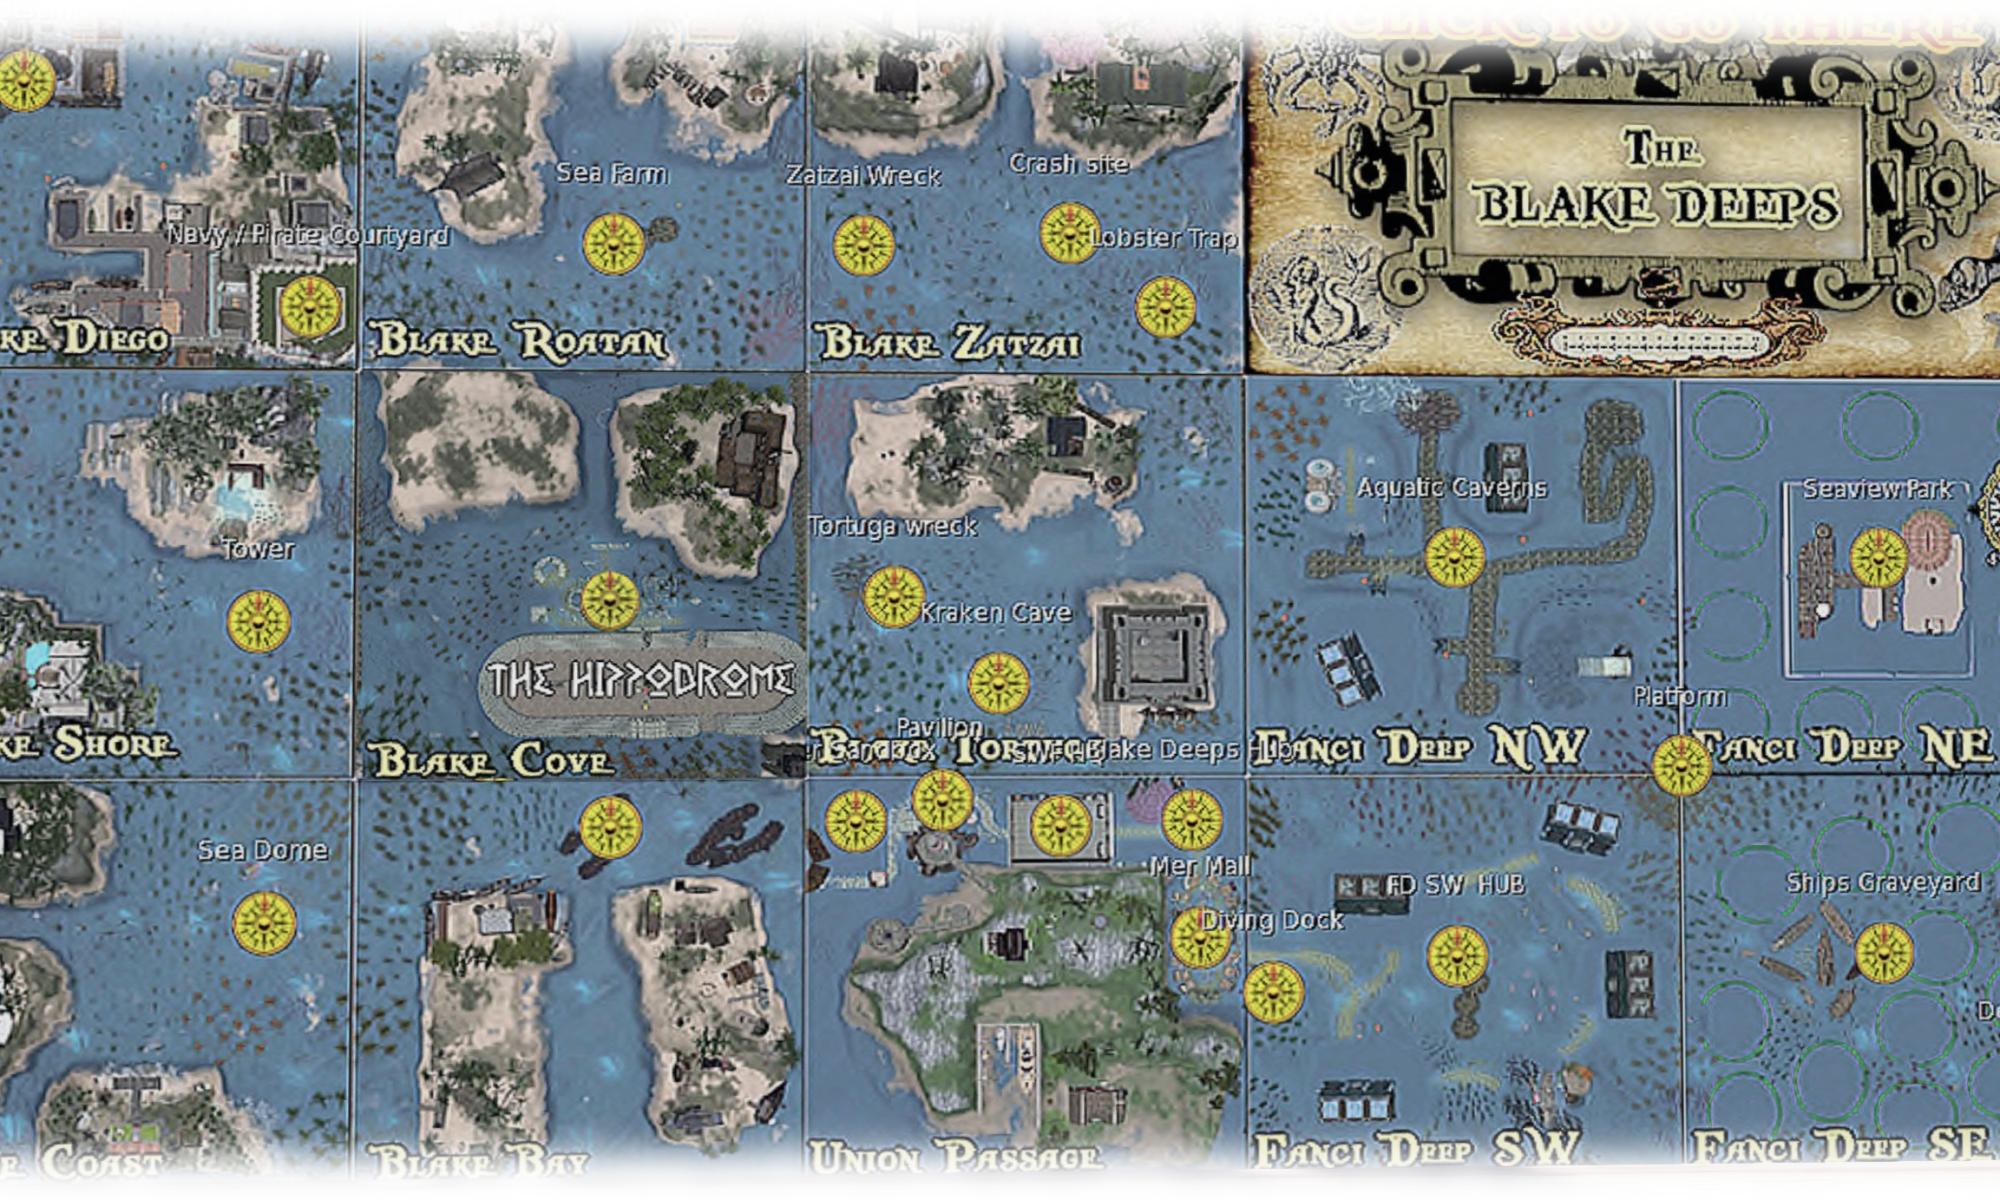 The undersea world of Blake Deeps